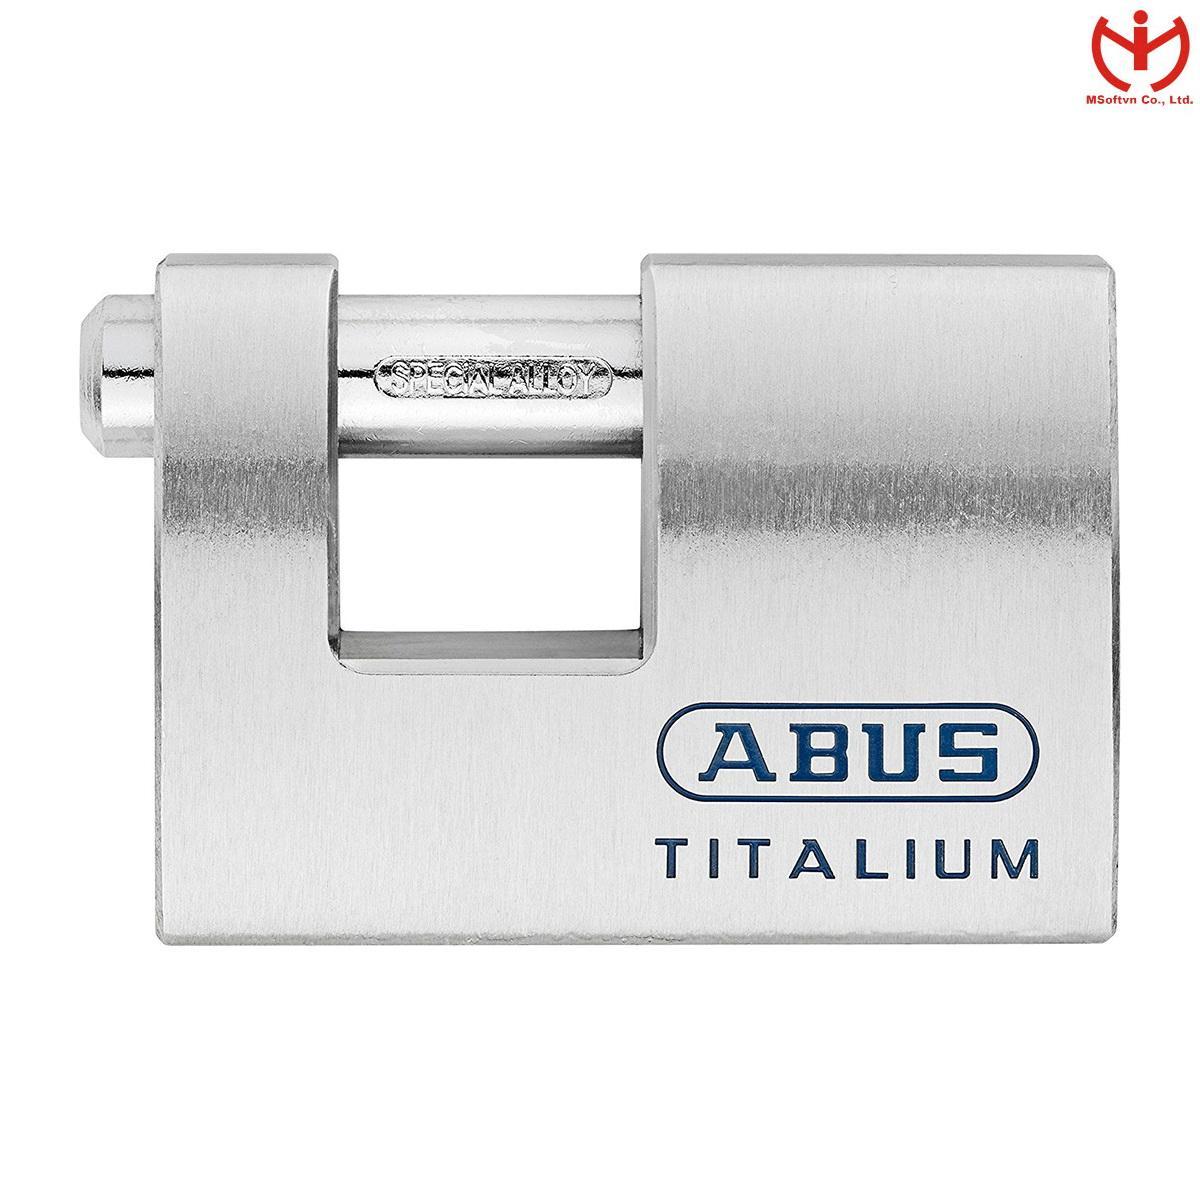 Khóa cầu ngang ABUS 98TI/90 (Titalium)